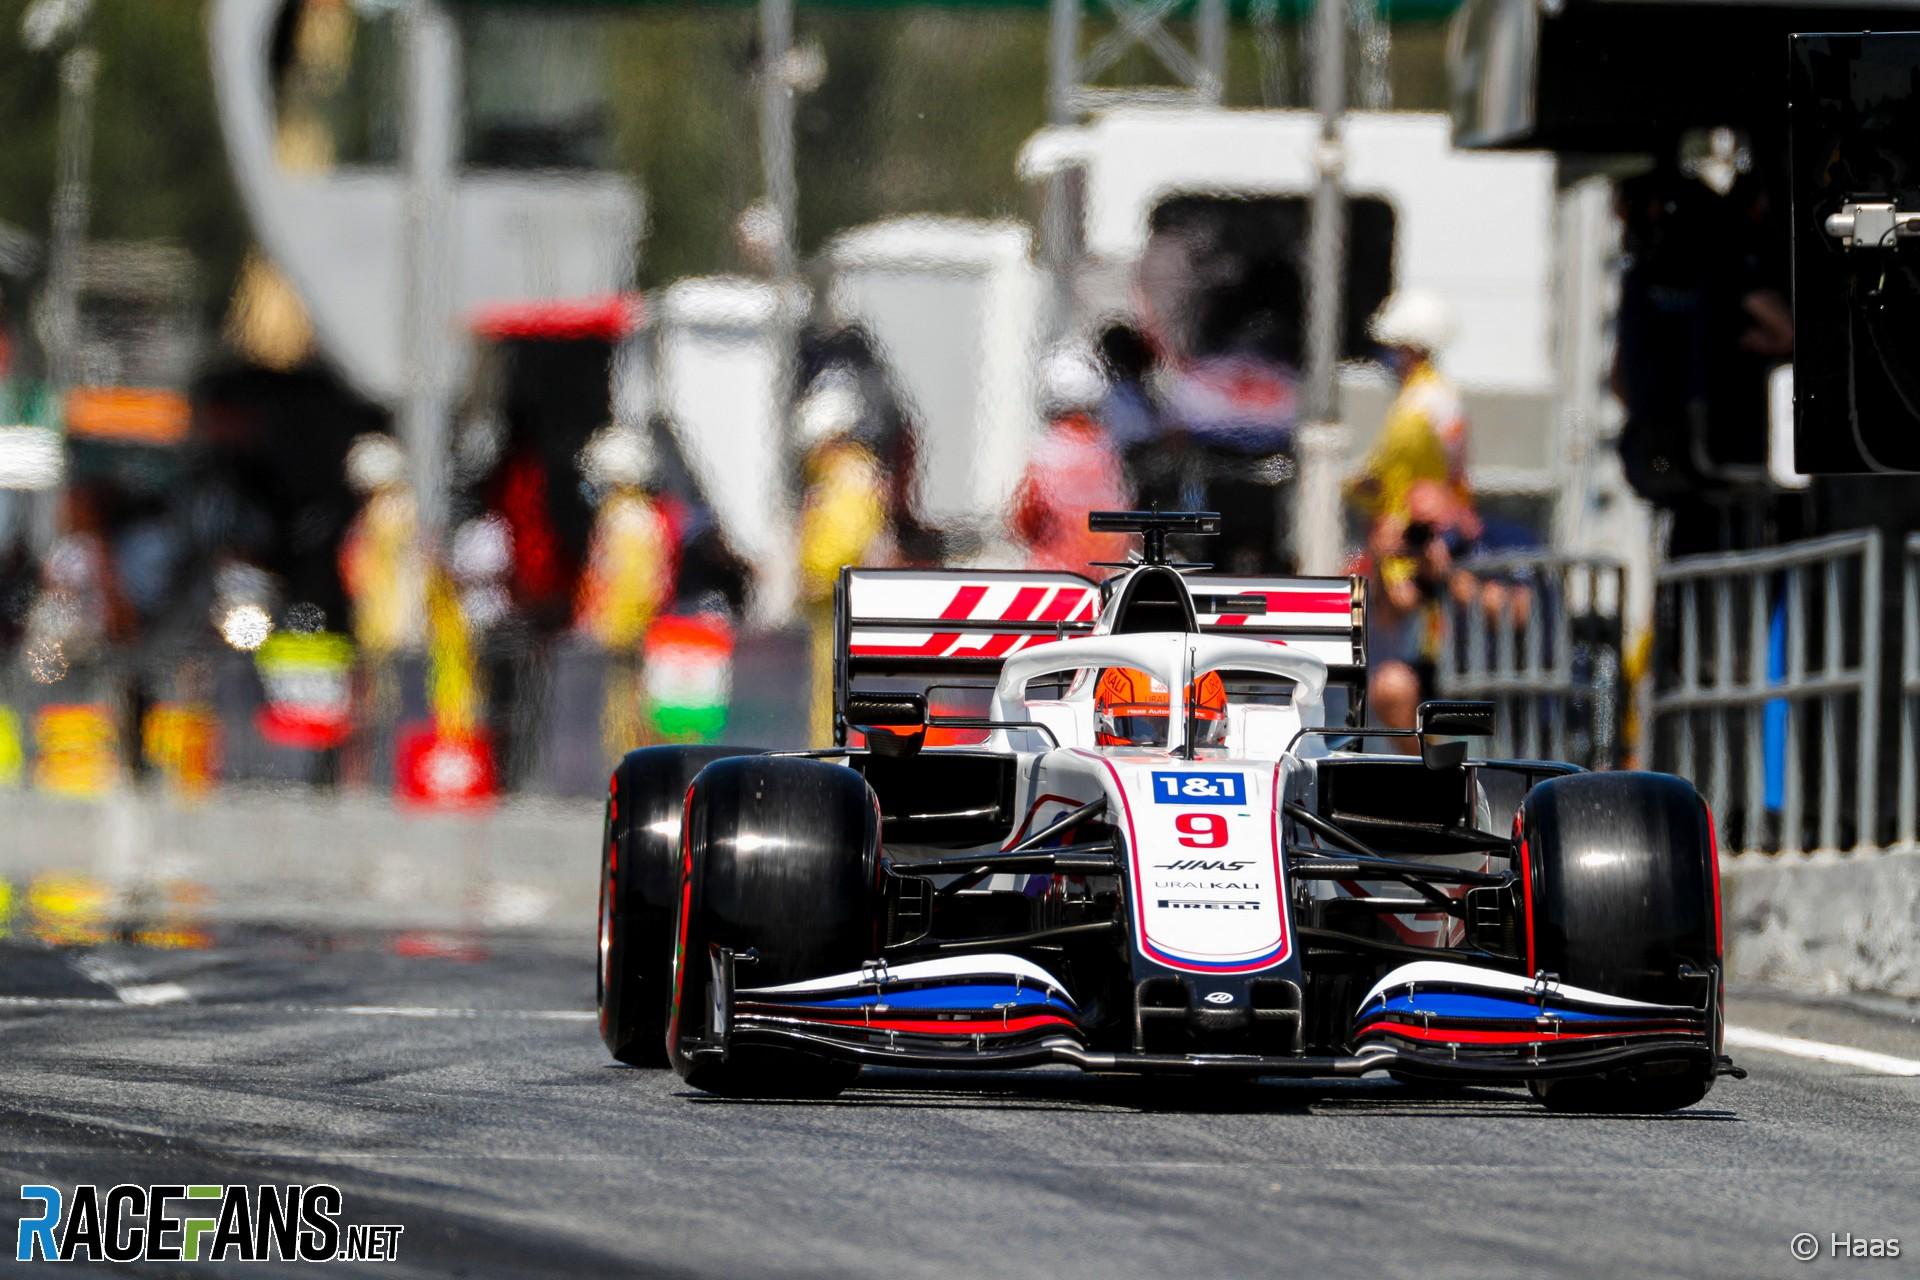 Nikita Mazepin, Haas, Circuit de Catalunya, 2021